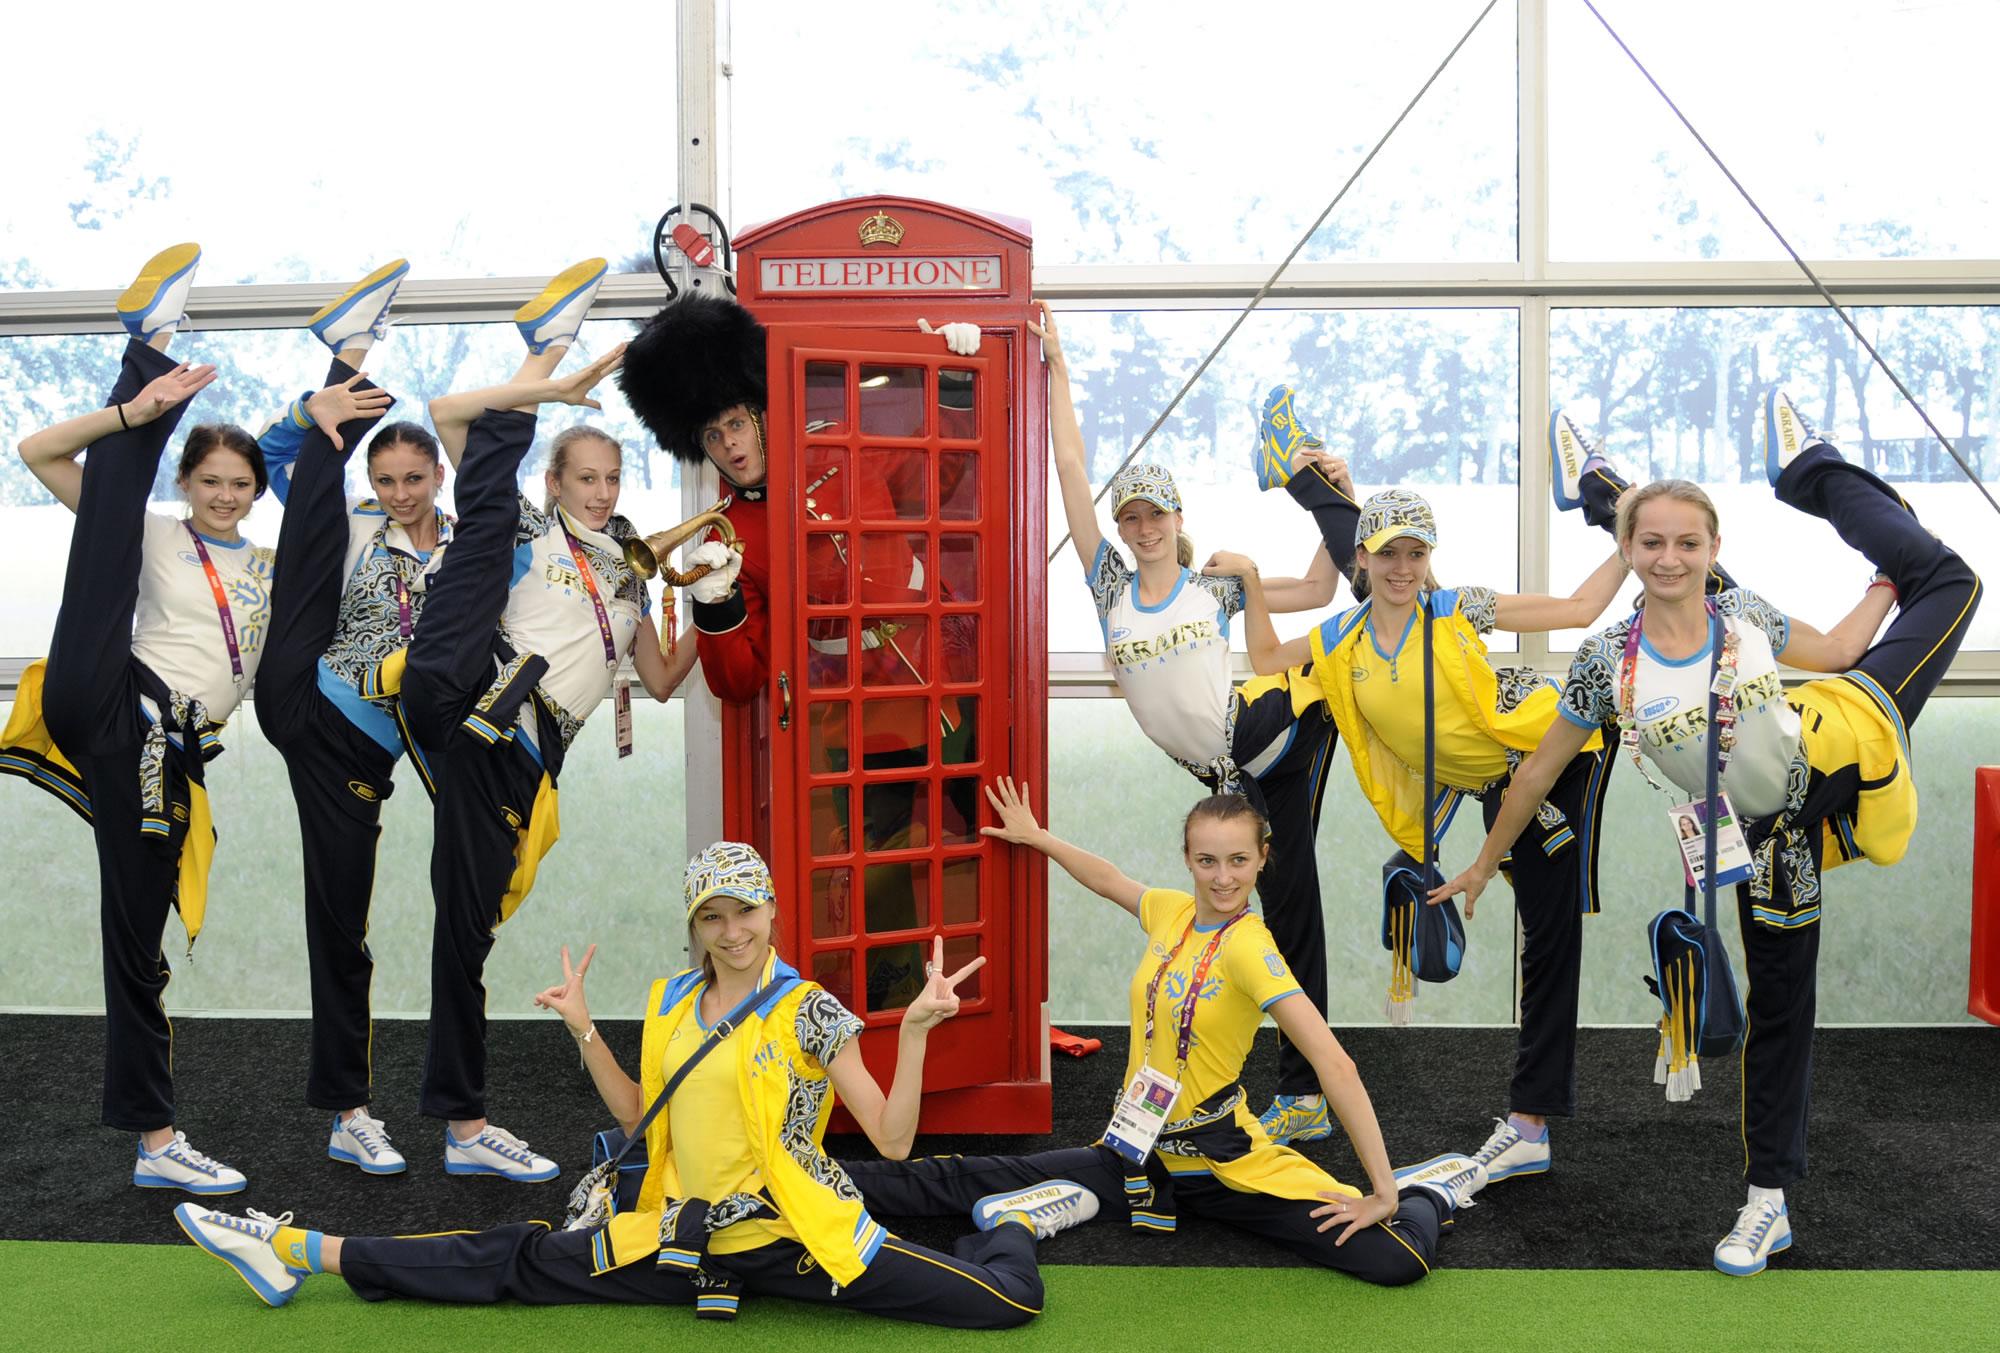 Heathrow London Olympics gymnasts